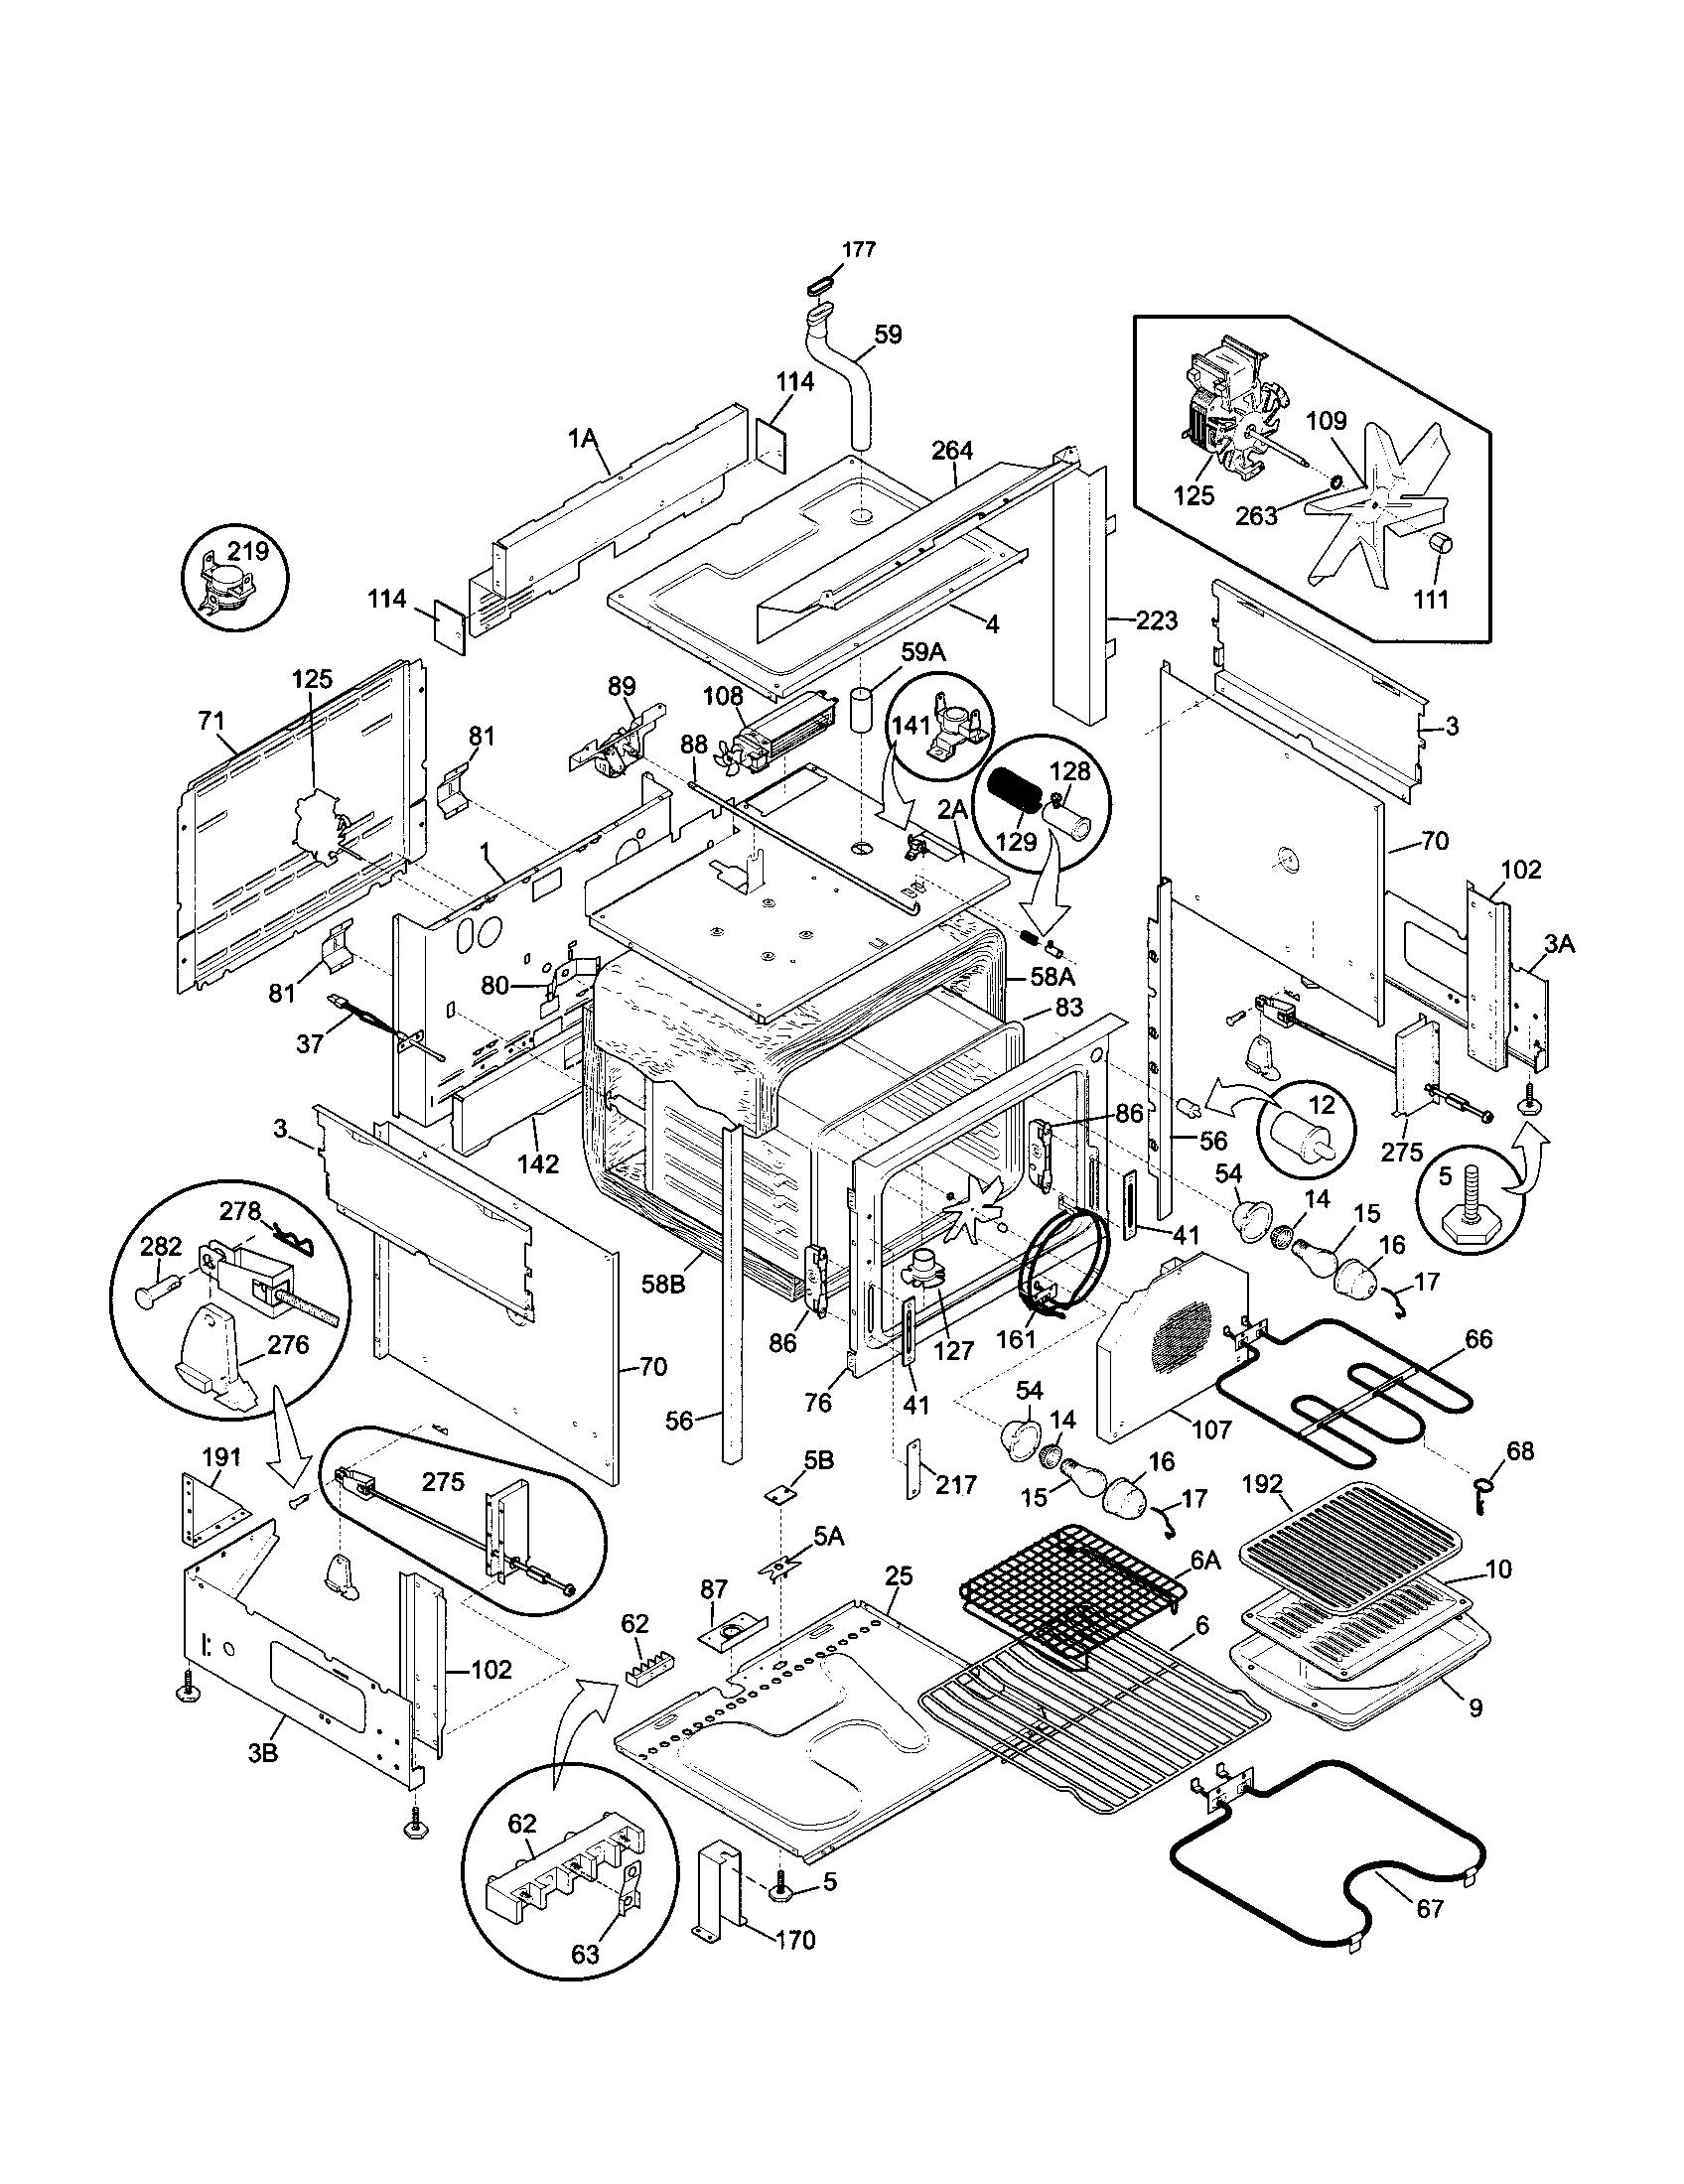 Wiring Diagram For Estate Dryer